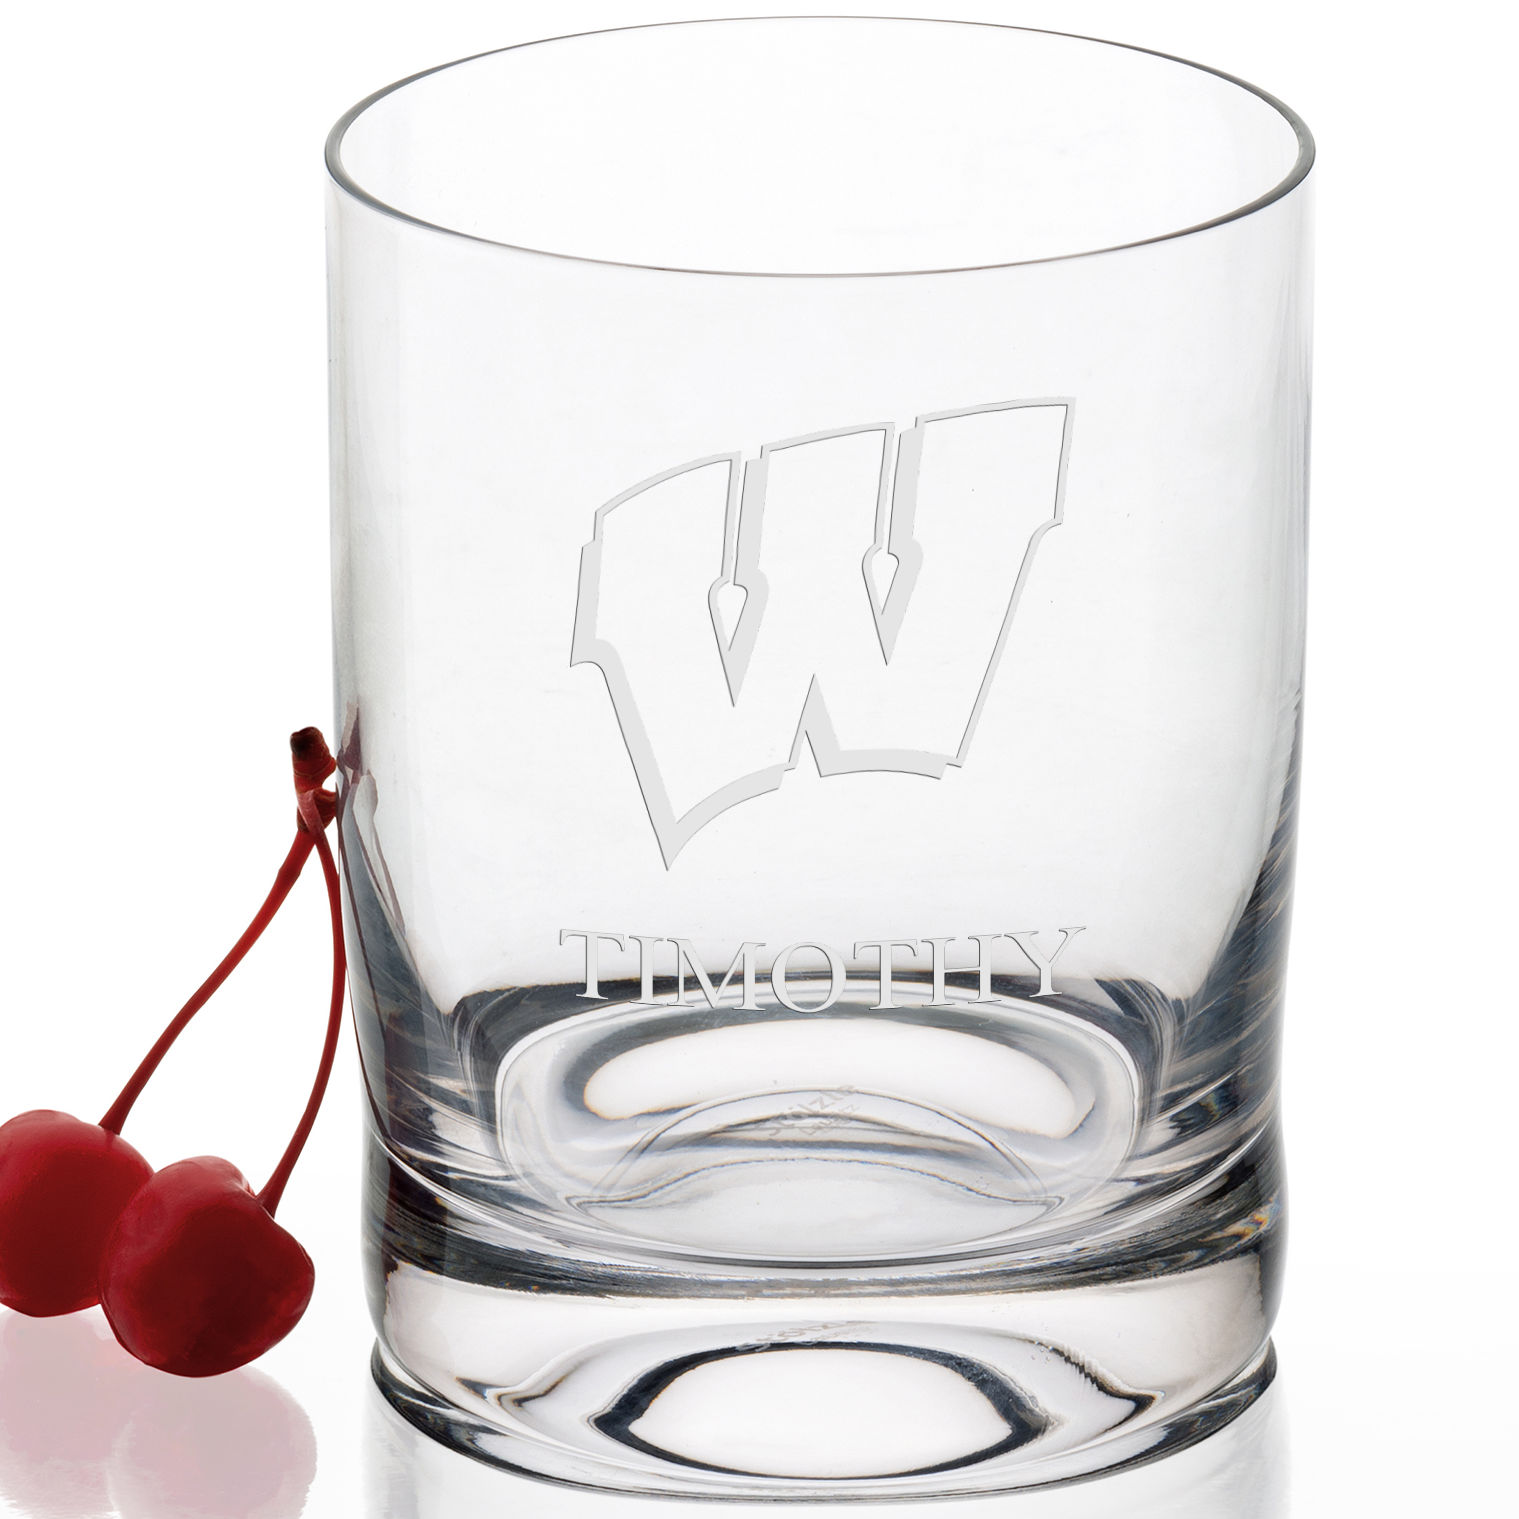 Wisconsin Tumbler Glasses - Set of 4 - Image 2